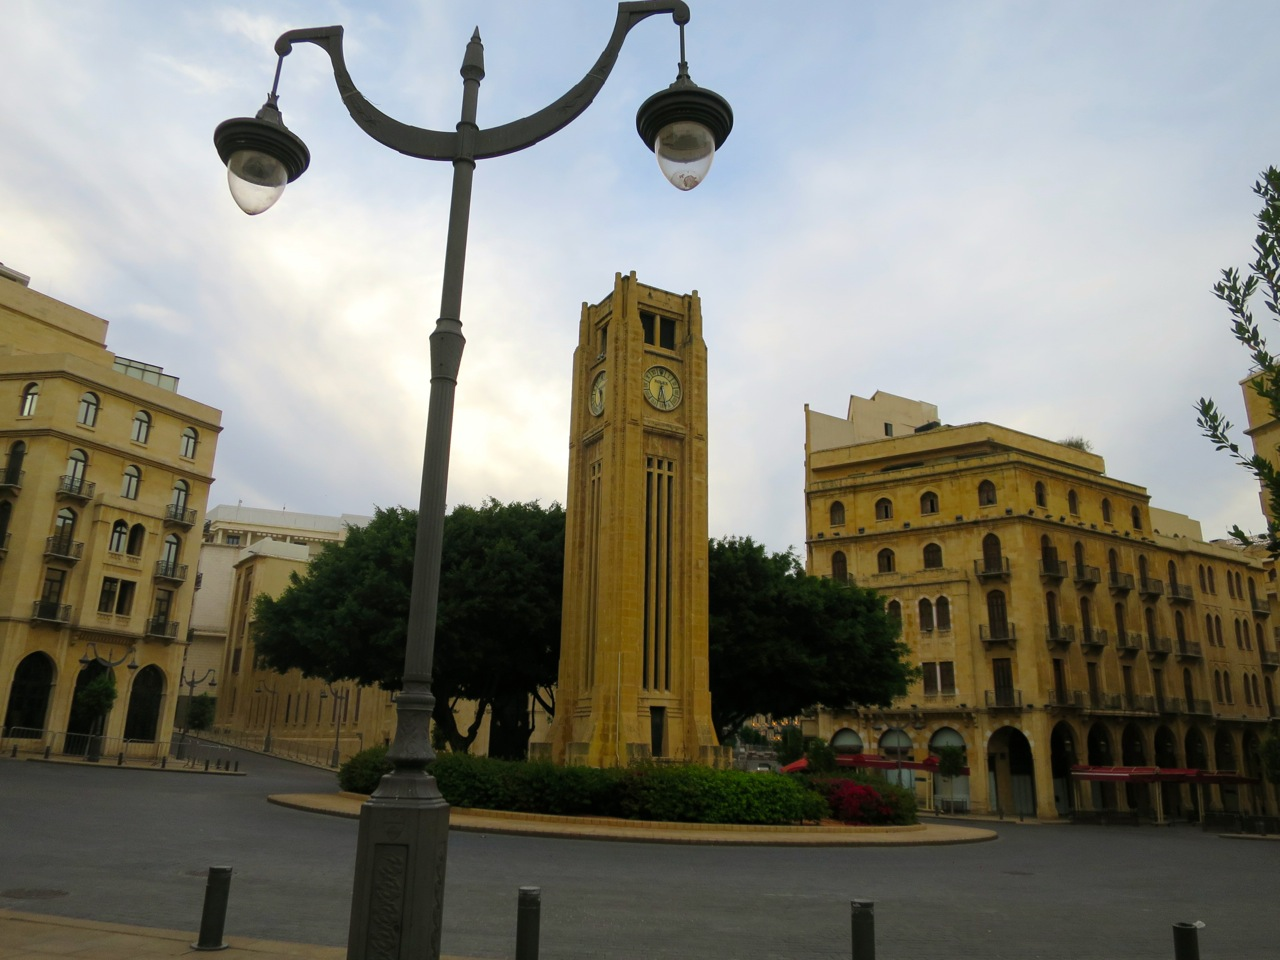 Beirute 2-17